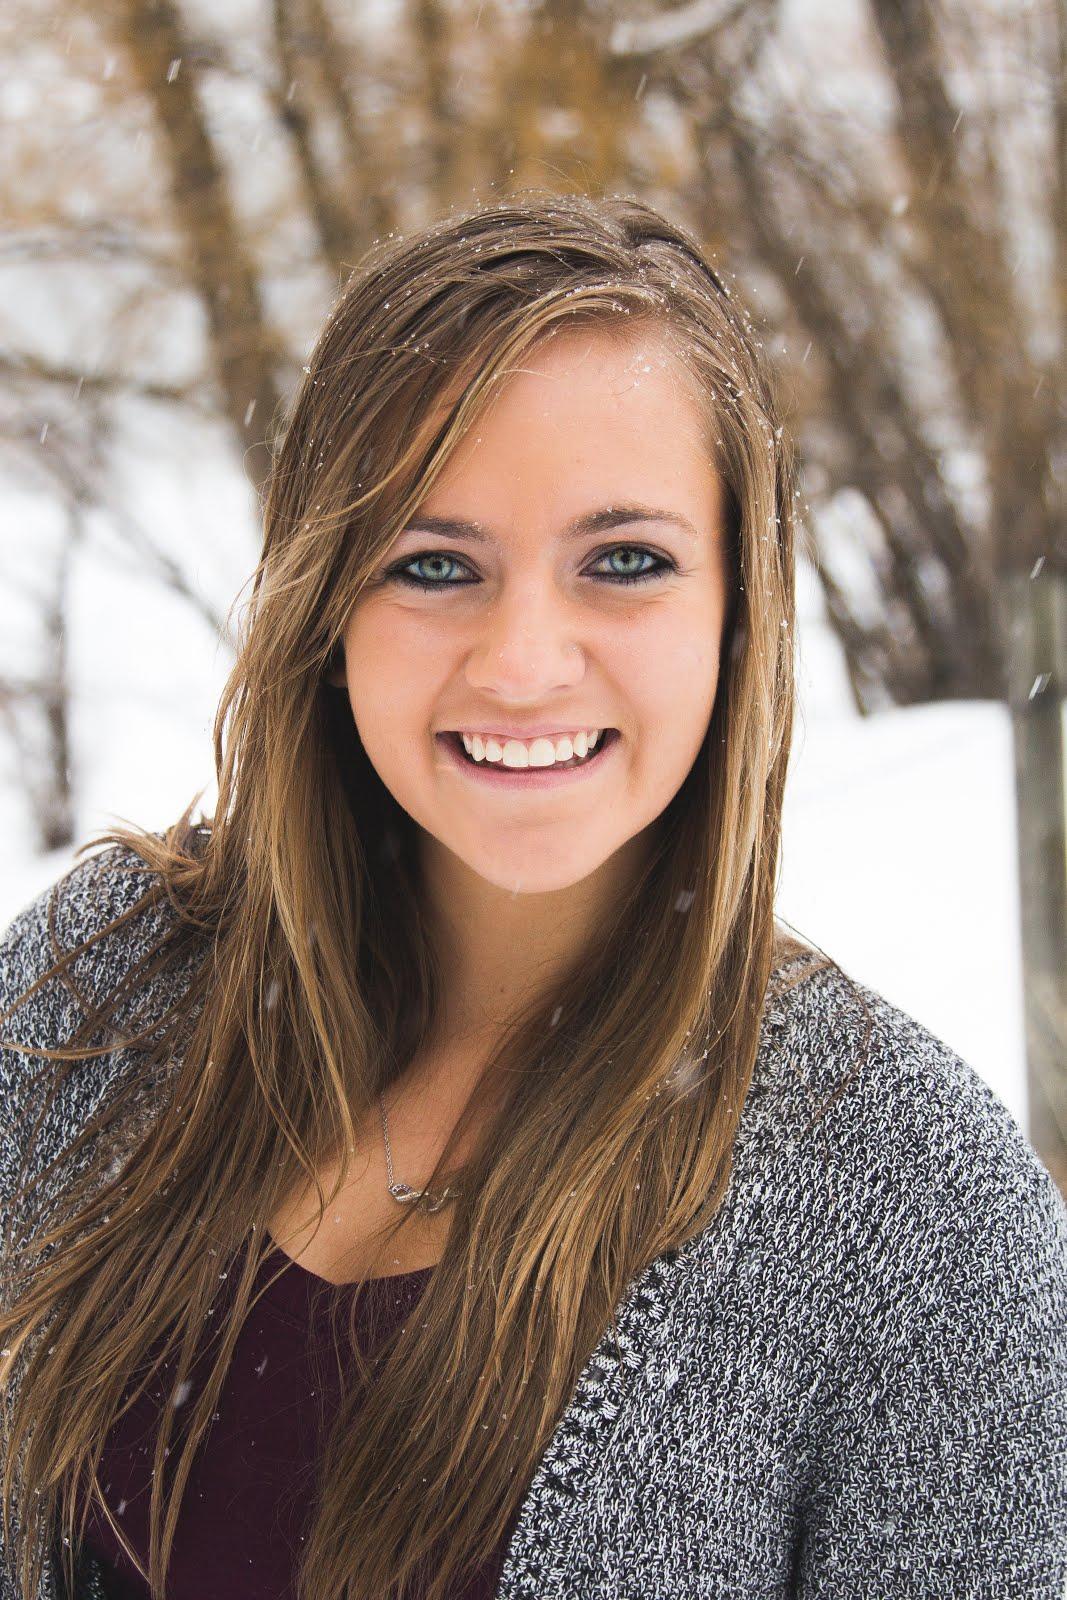 Sister Katie Morgan